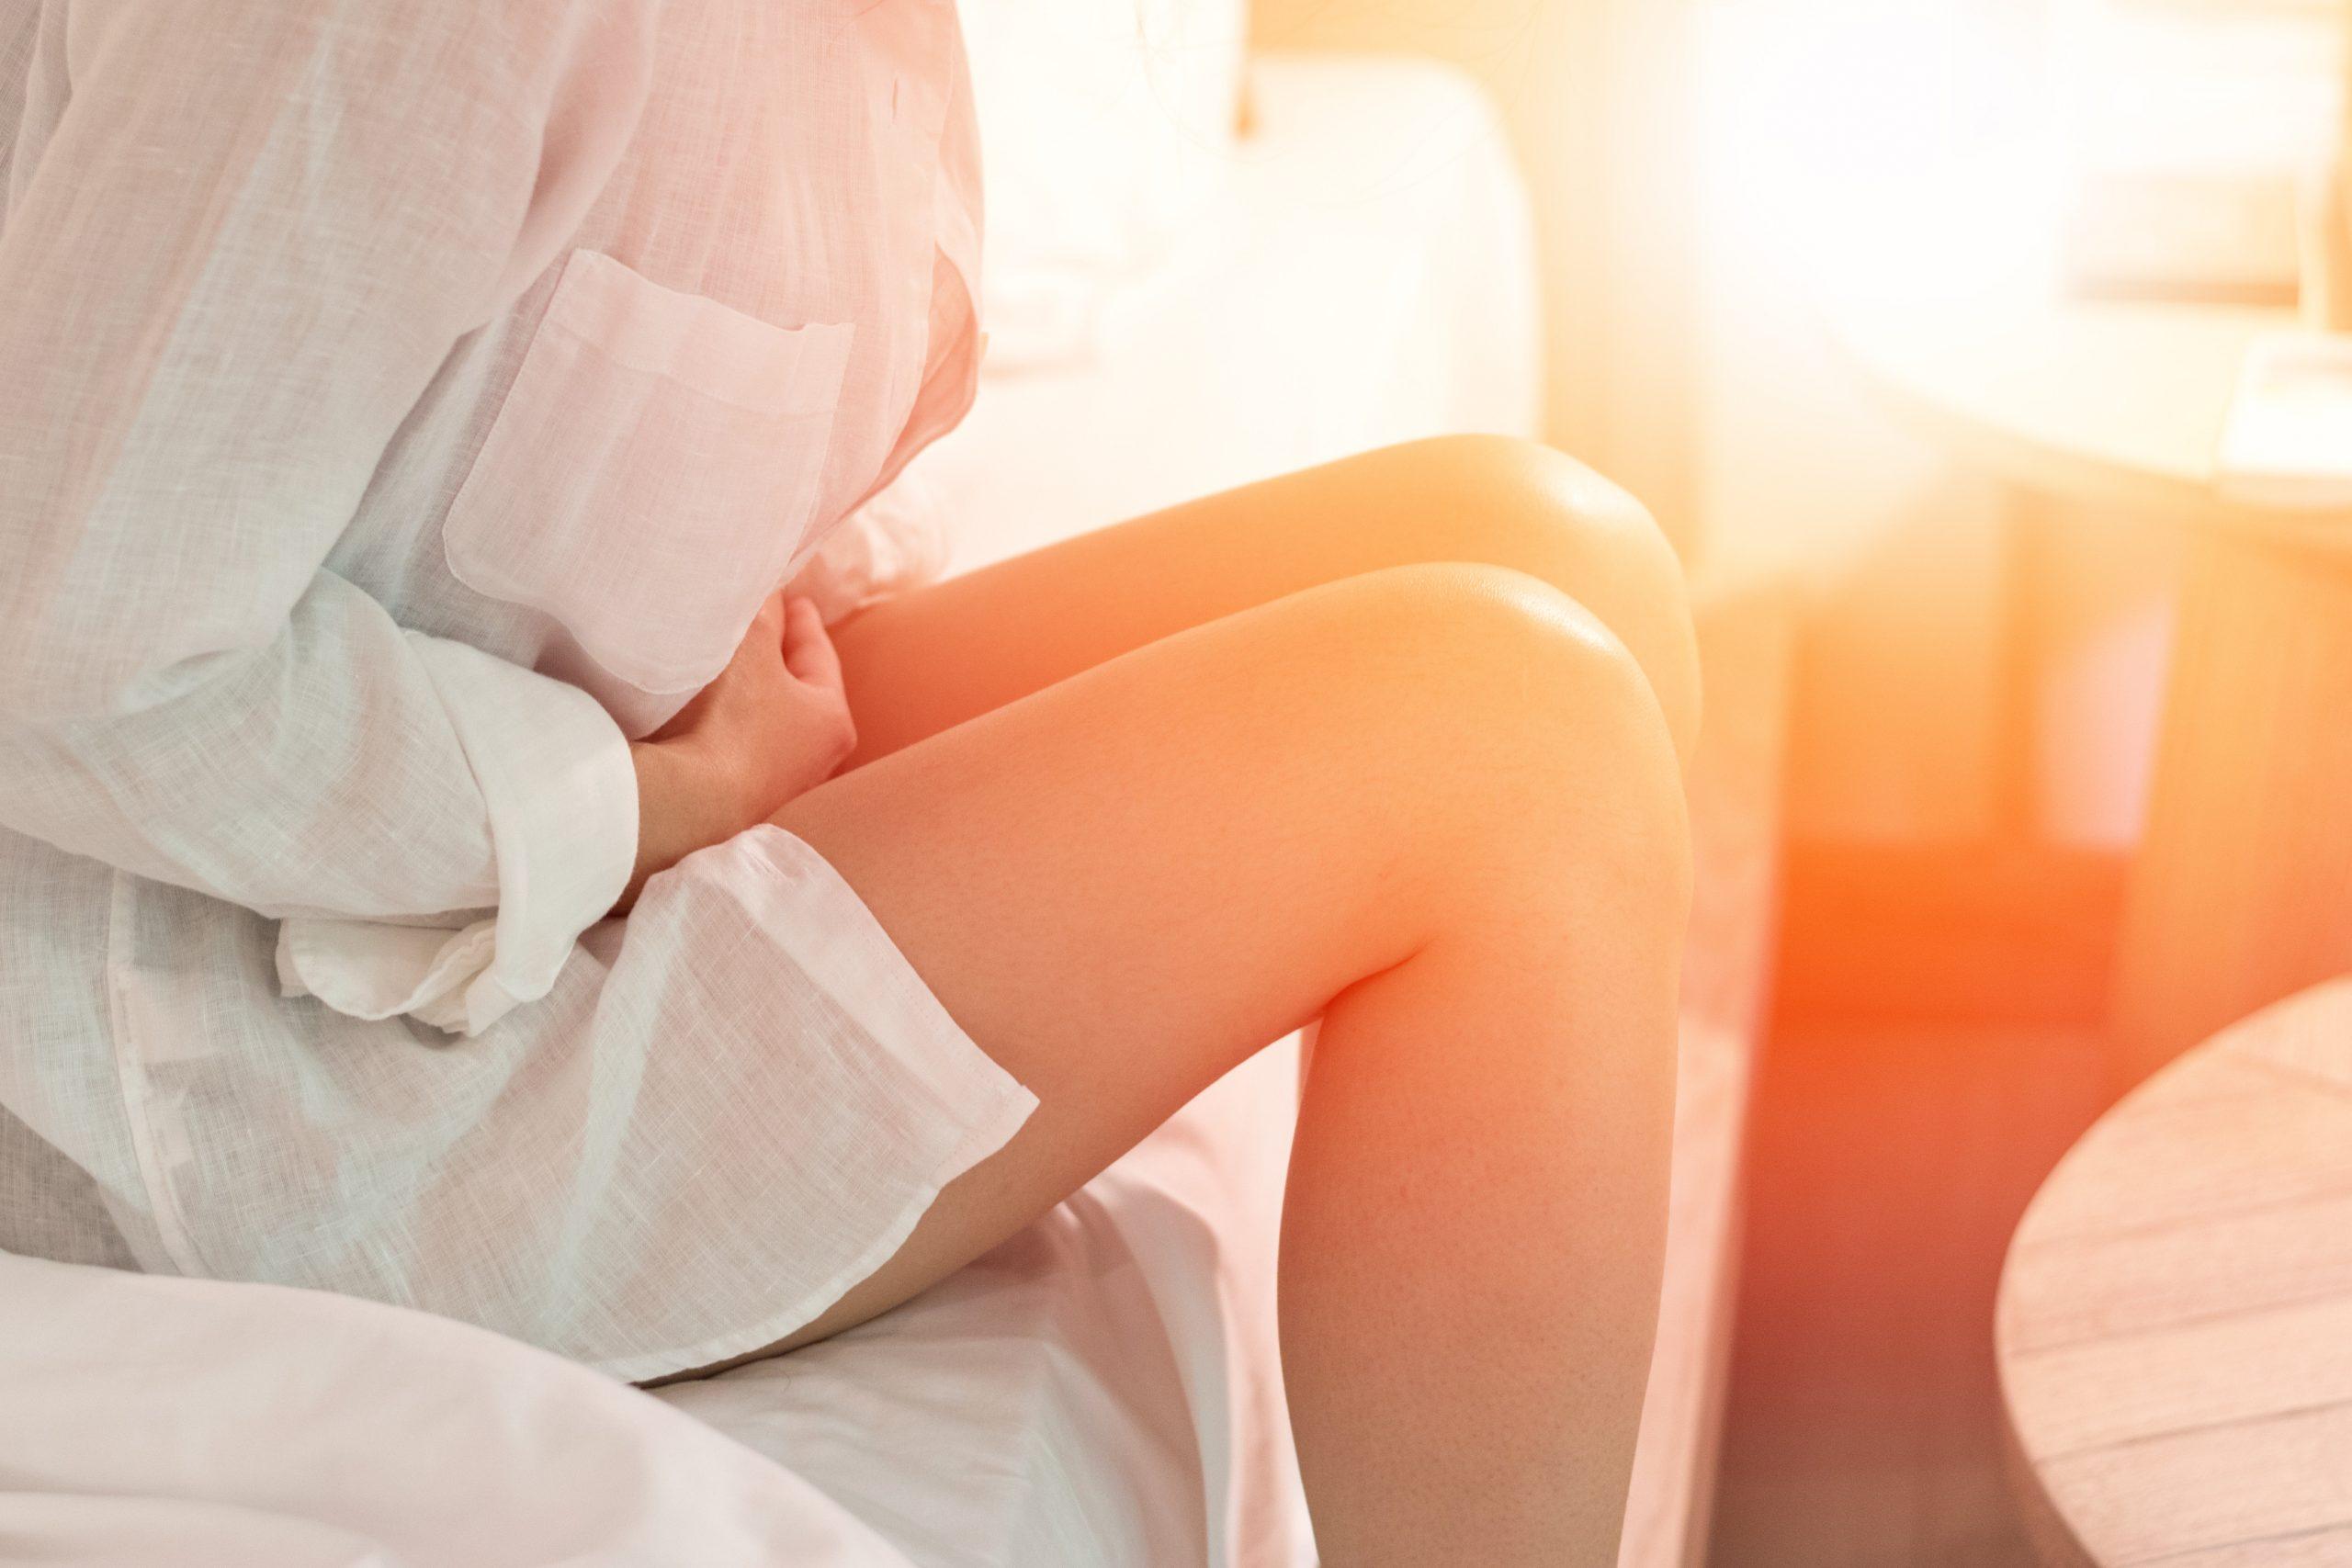 Could It Be Endometriosis?